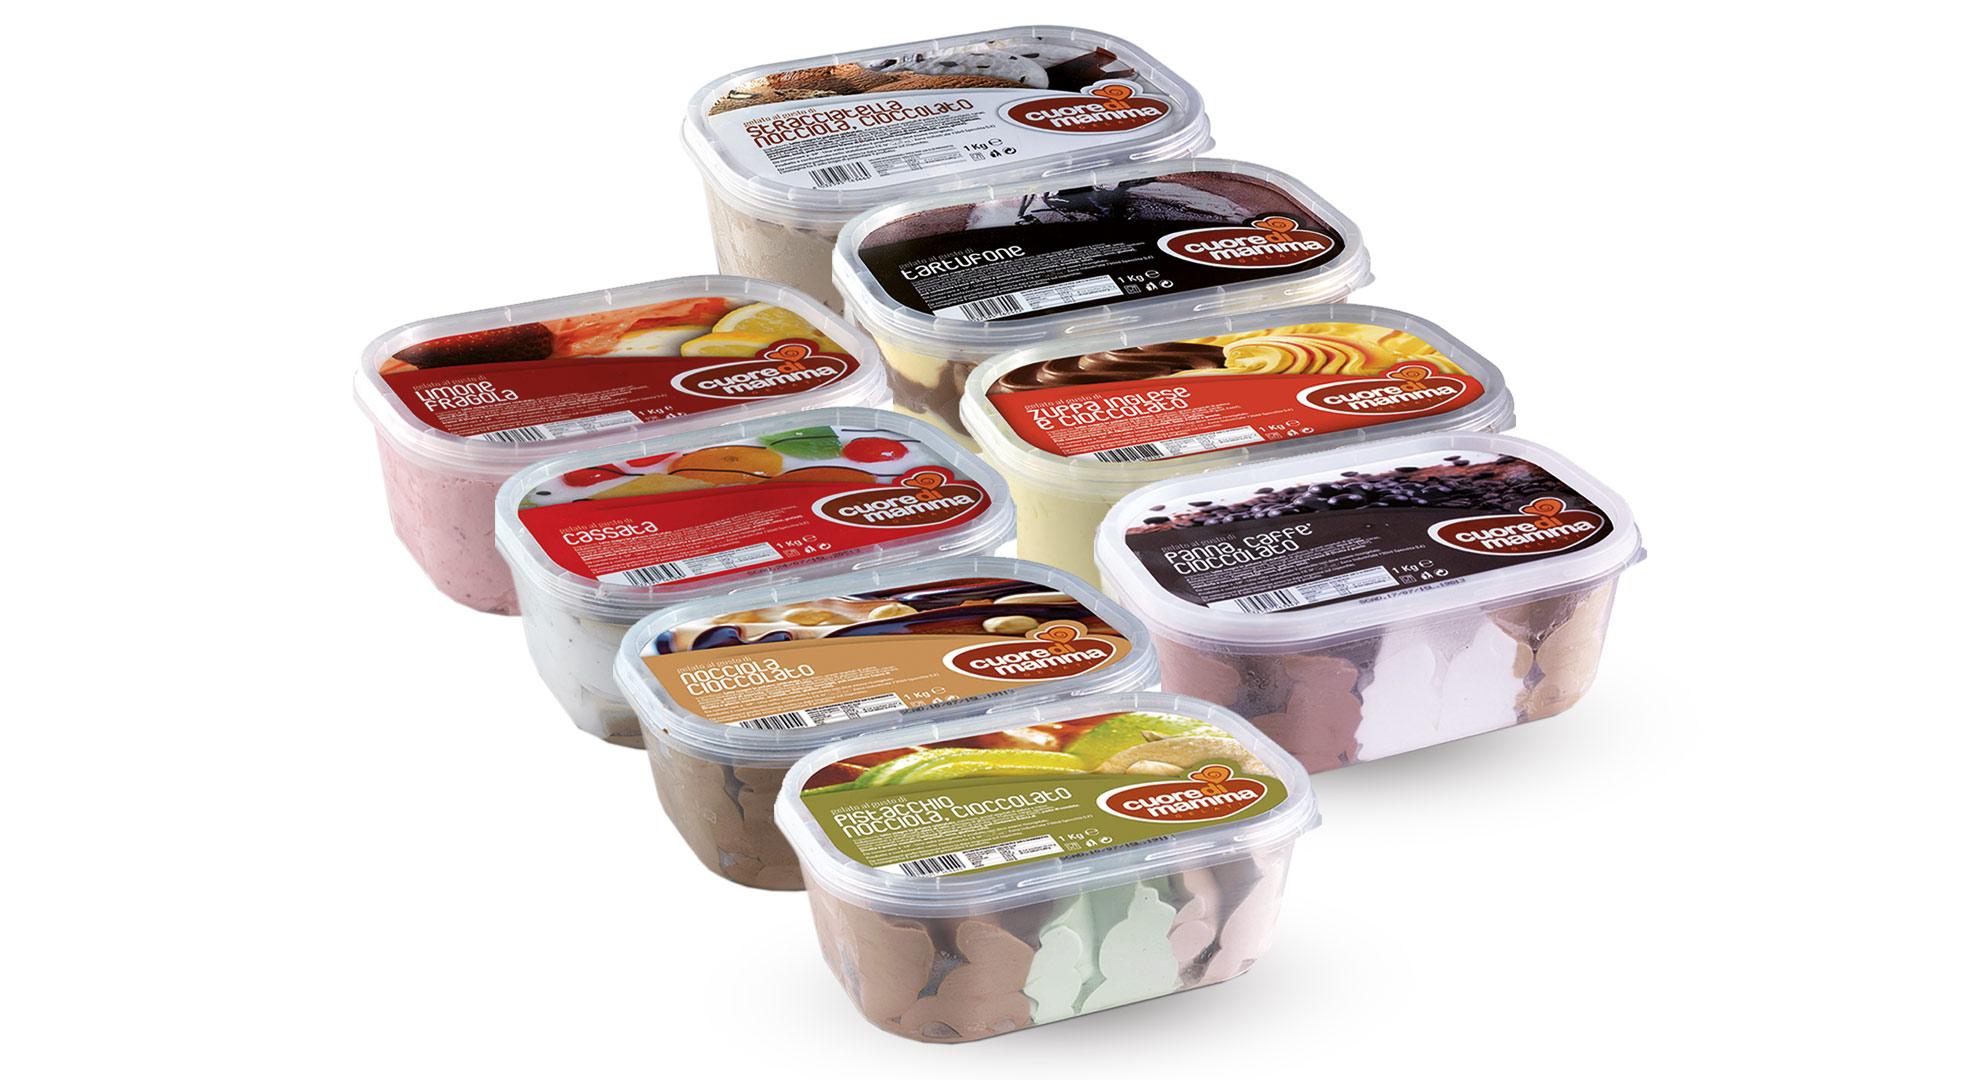 Vaschette gelato da 1000 g